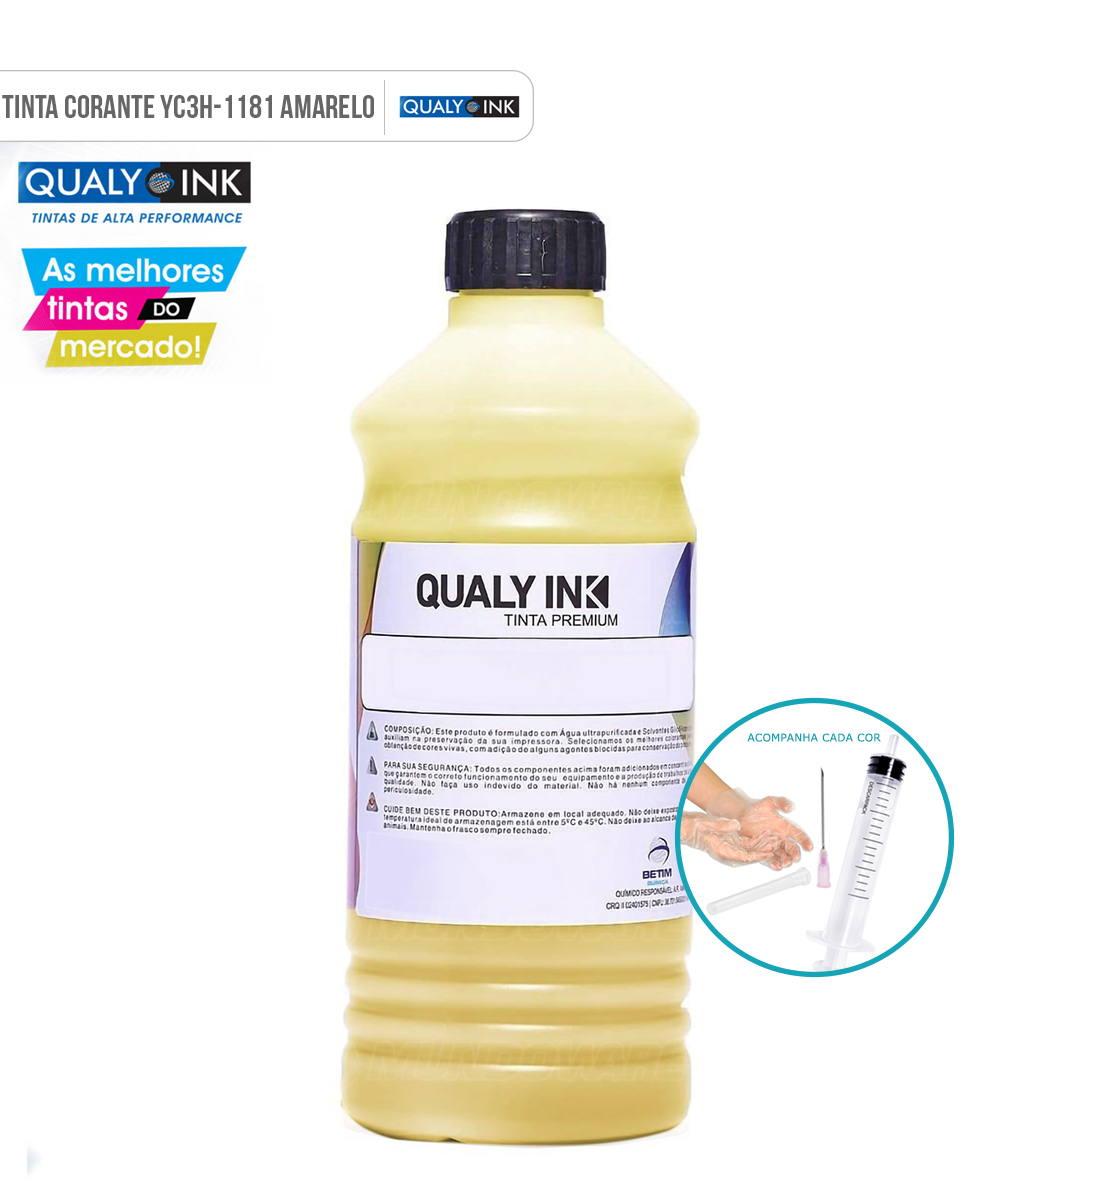 Tinta Corante Yellow para Impressora HP GT5822 GT5820 GT5810 GT-5822 GT-5820 GT-5810 InkTank 315 InkTank 316 InkTank 319 InkTank 410 InkTank 415 InkTank 416 InkTank 419 SmartTank 450 SmartTank 455